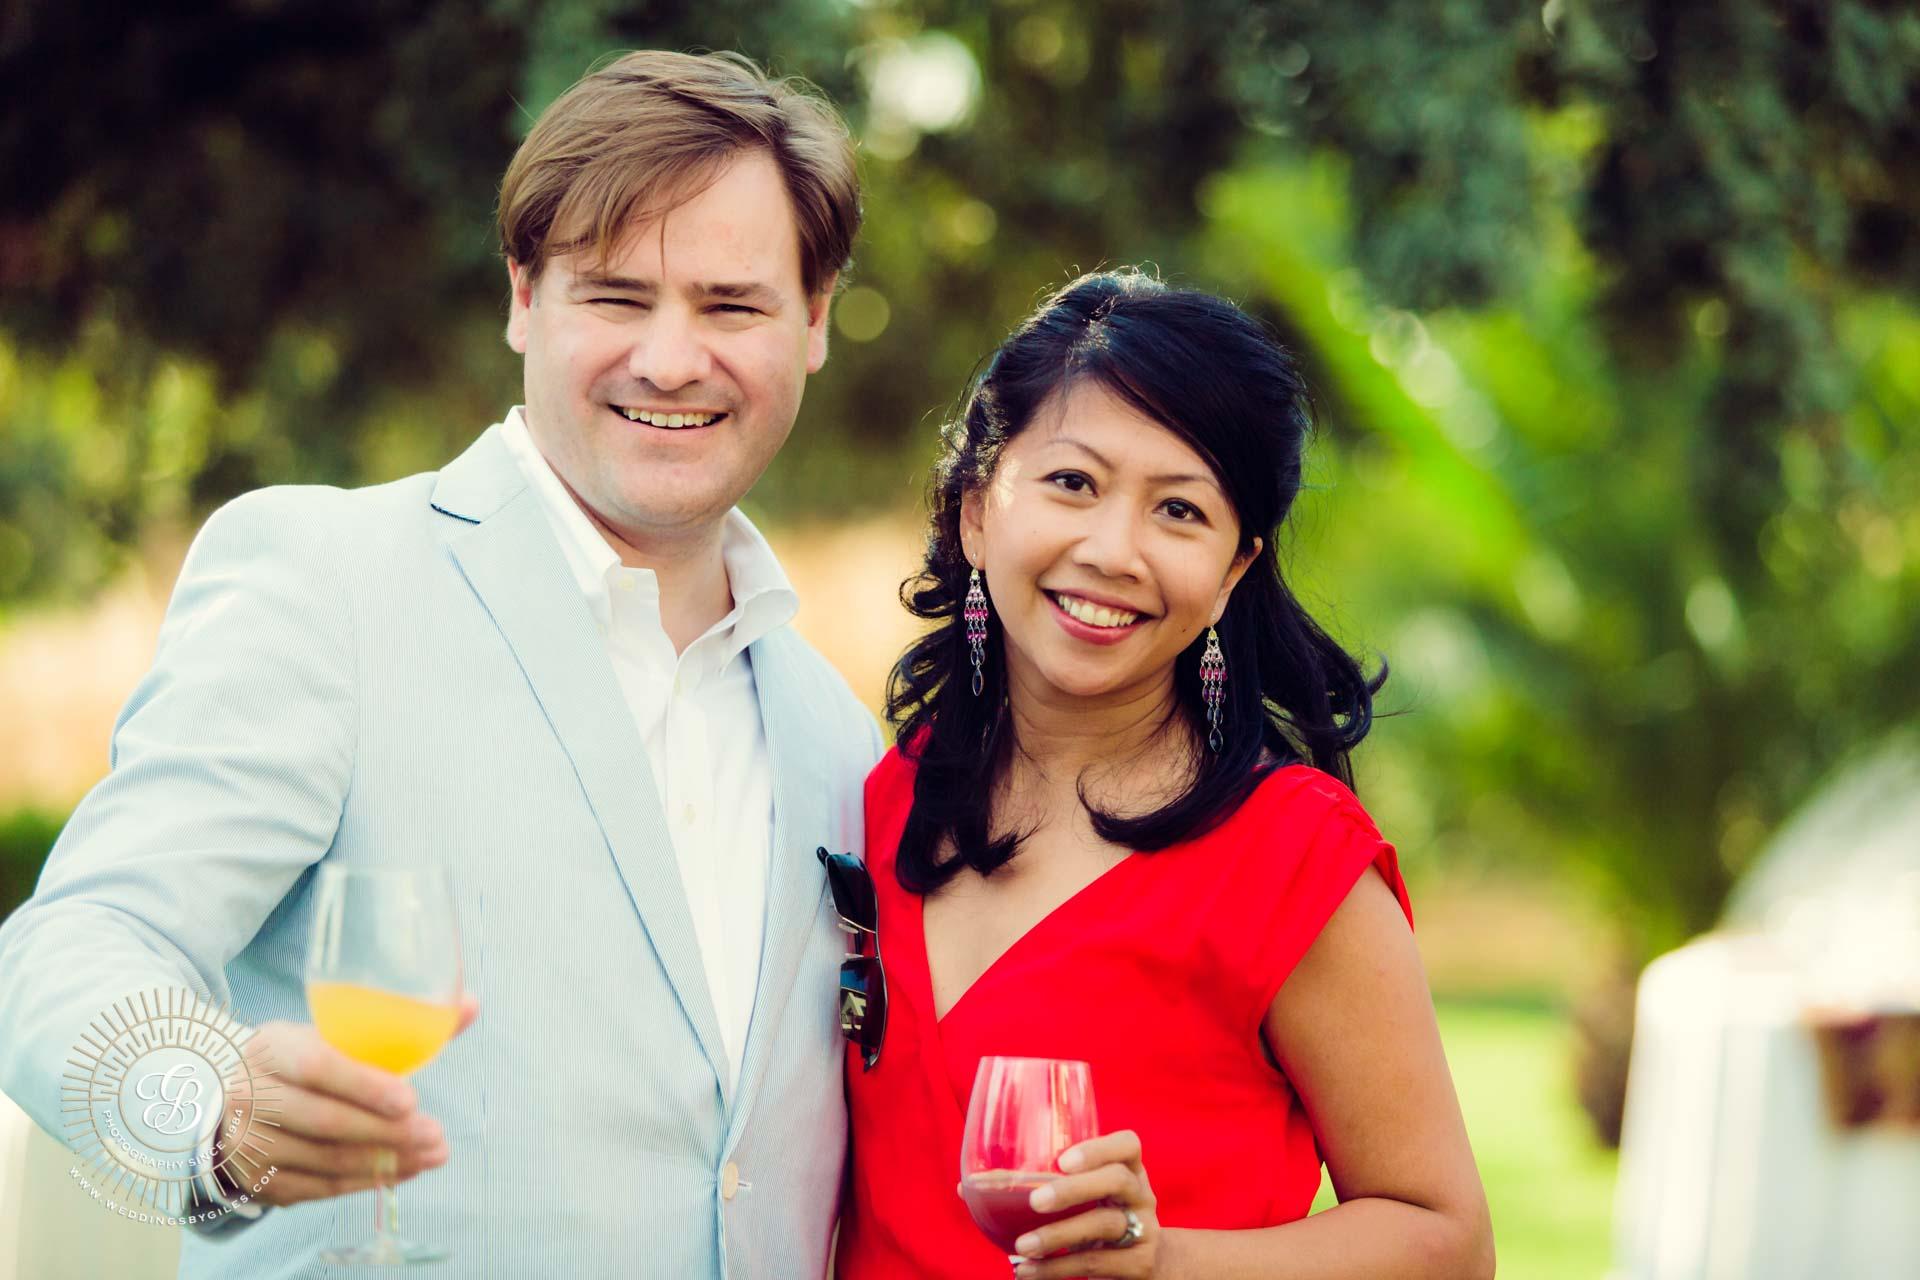 Sunny garden wedding in spain